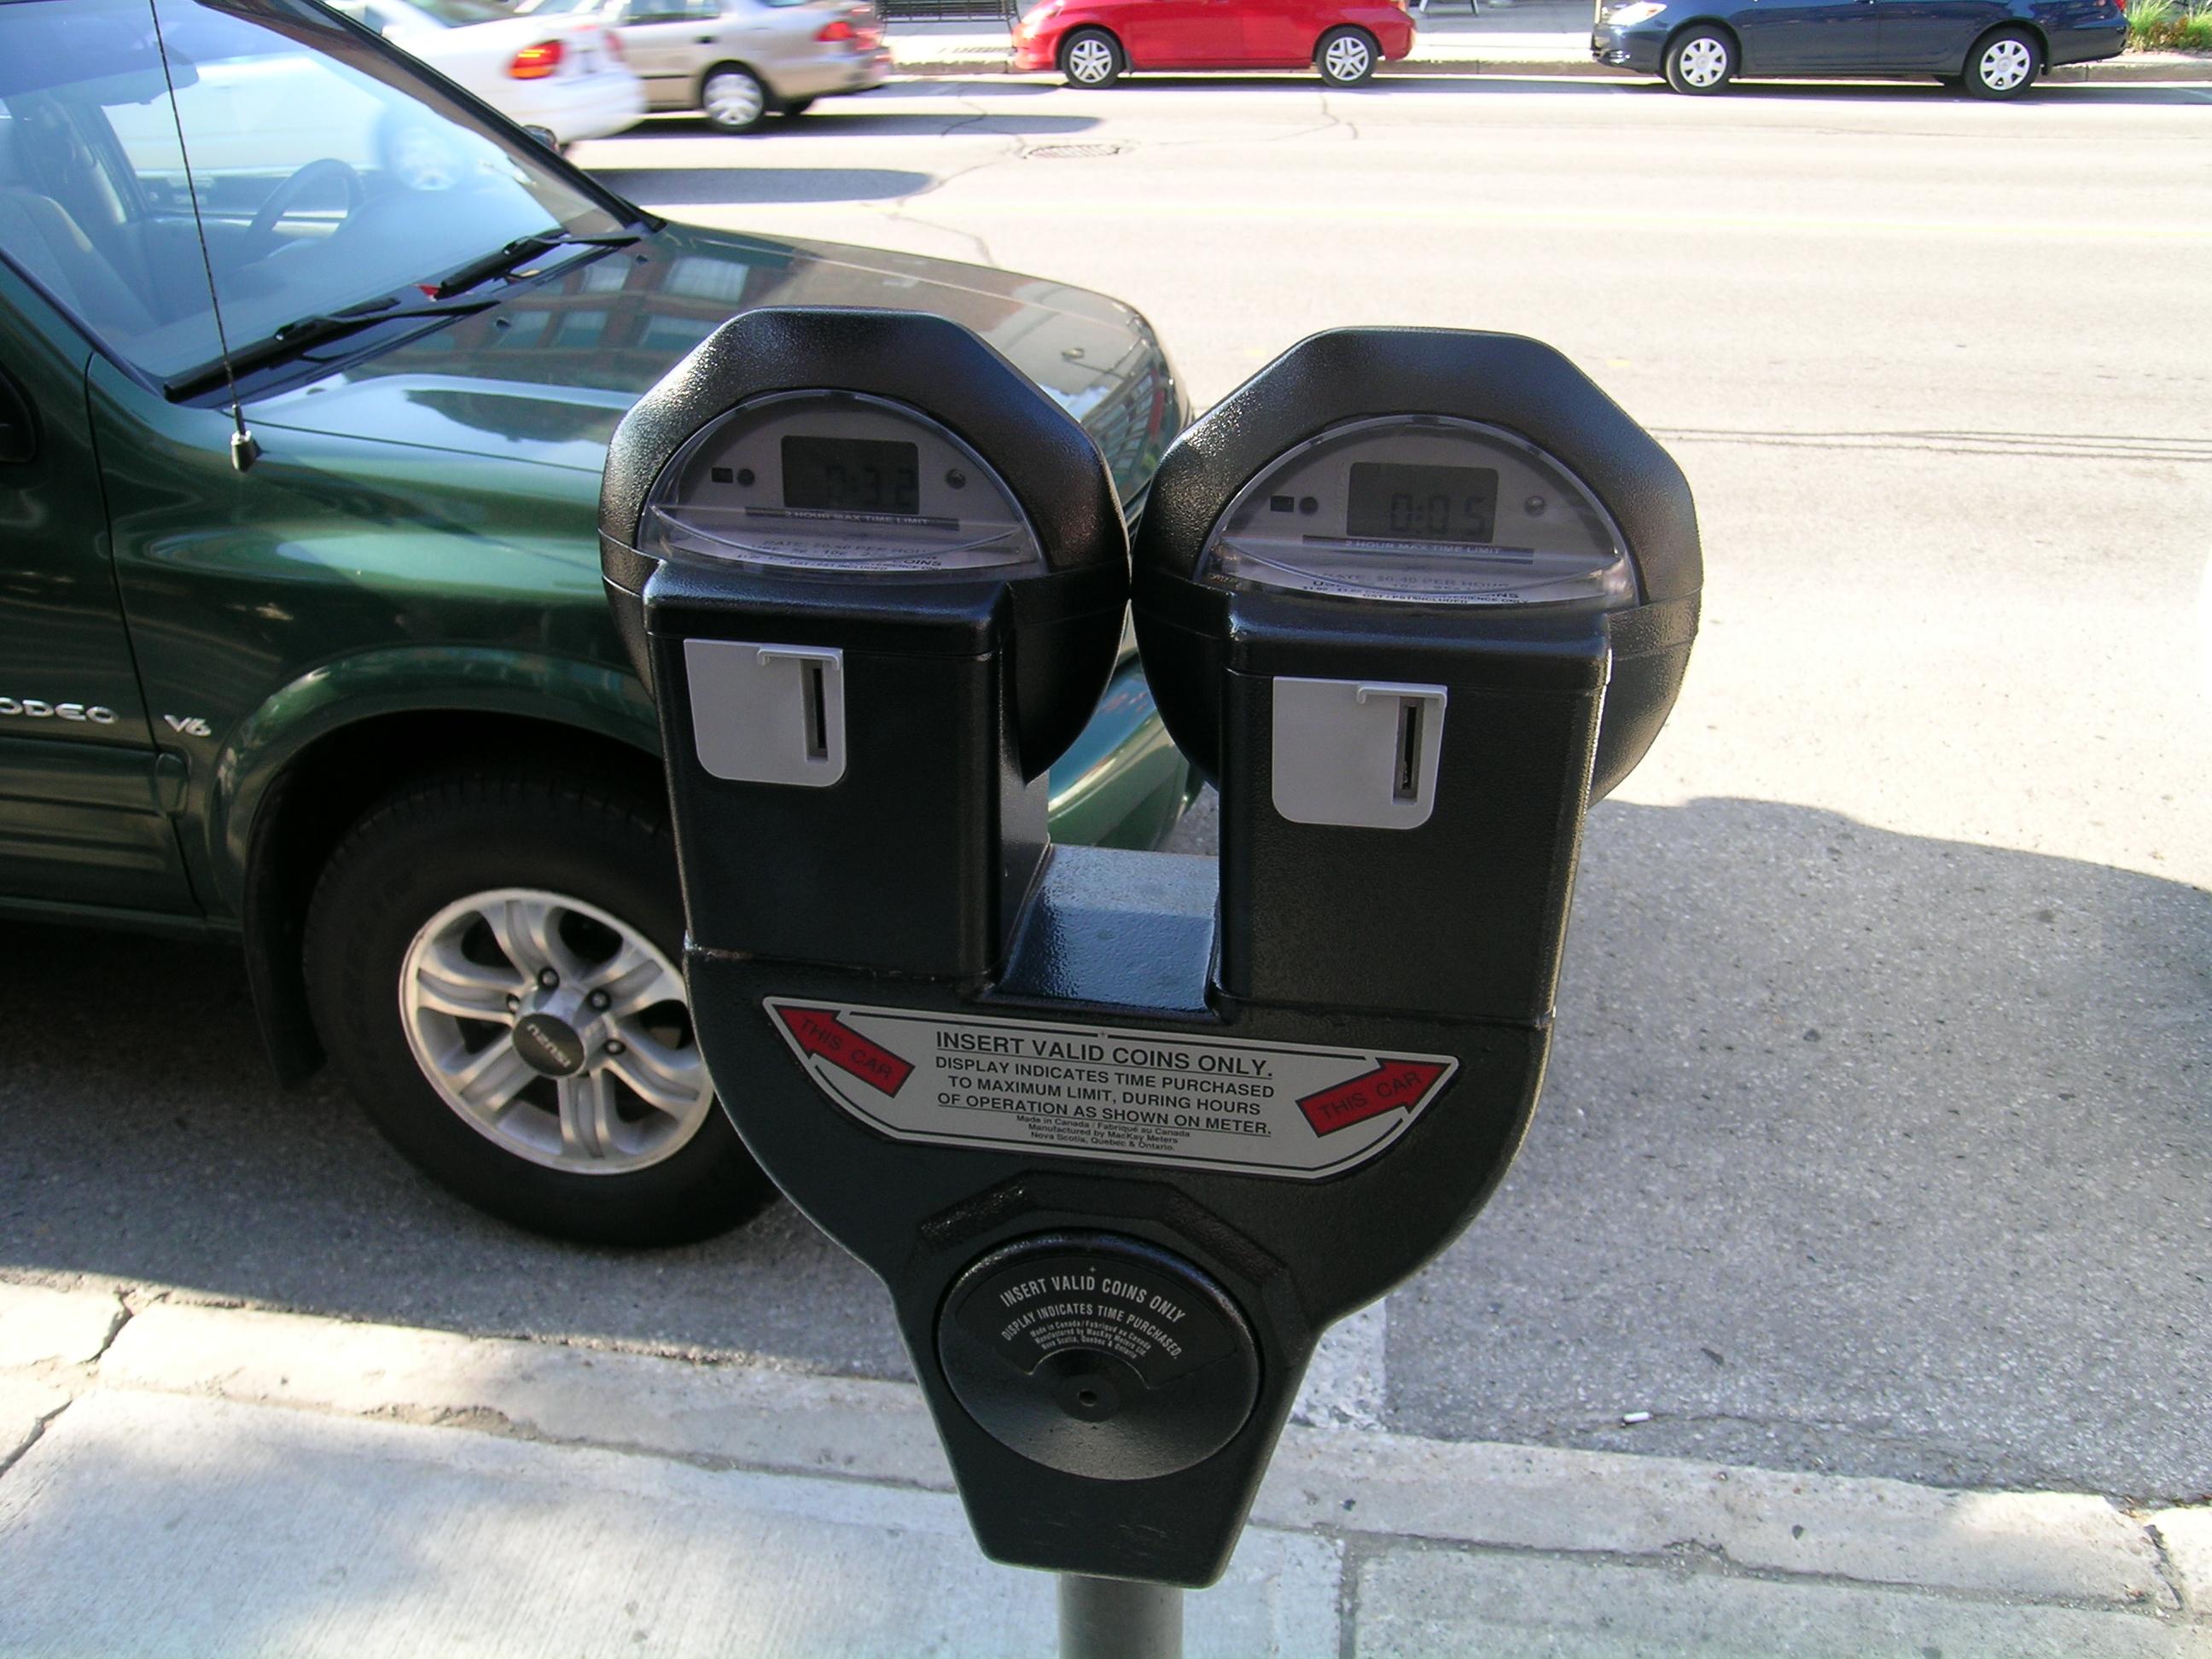 File:Parking meter ne.JPG - Wikimedia Commons